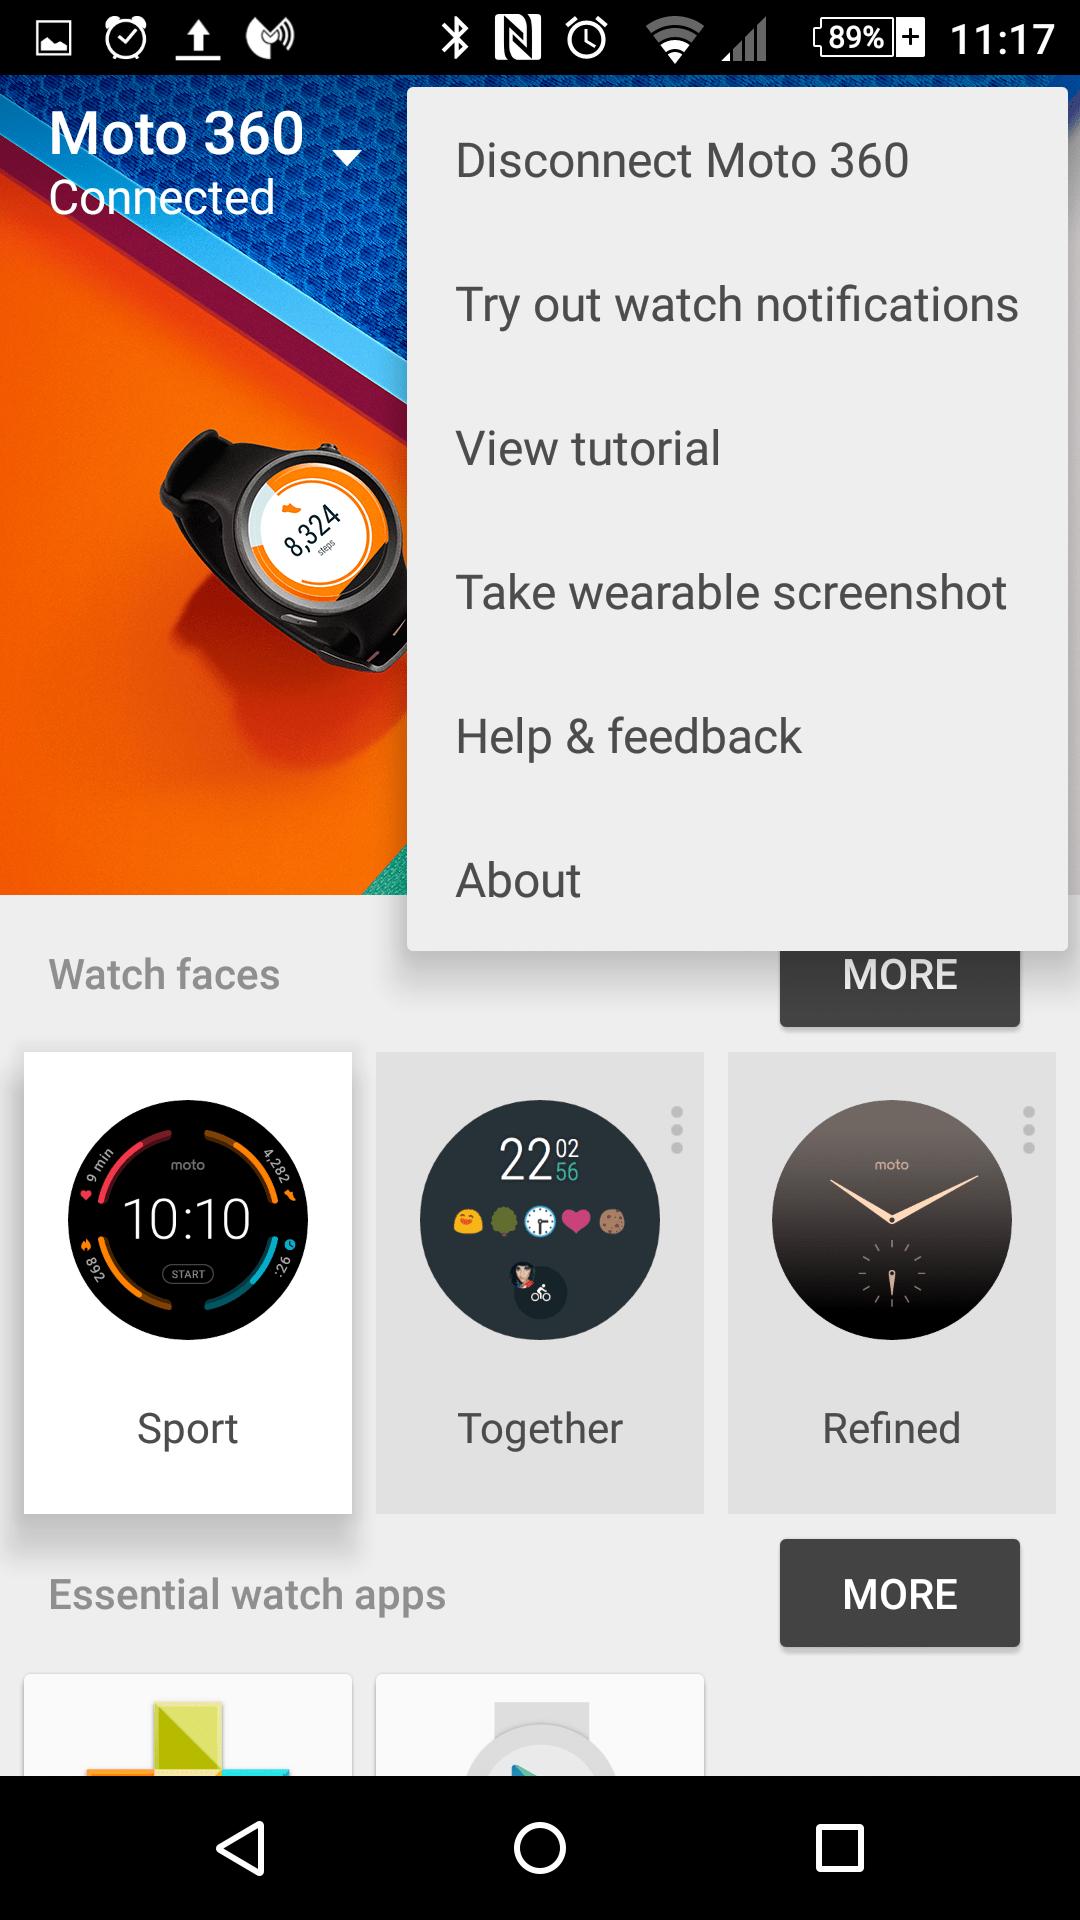 Screenshot 2015 12 21 11 17 21